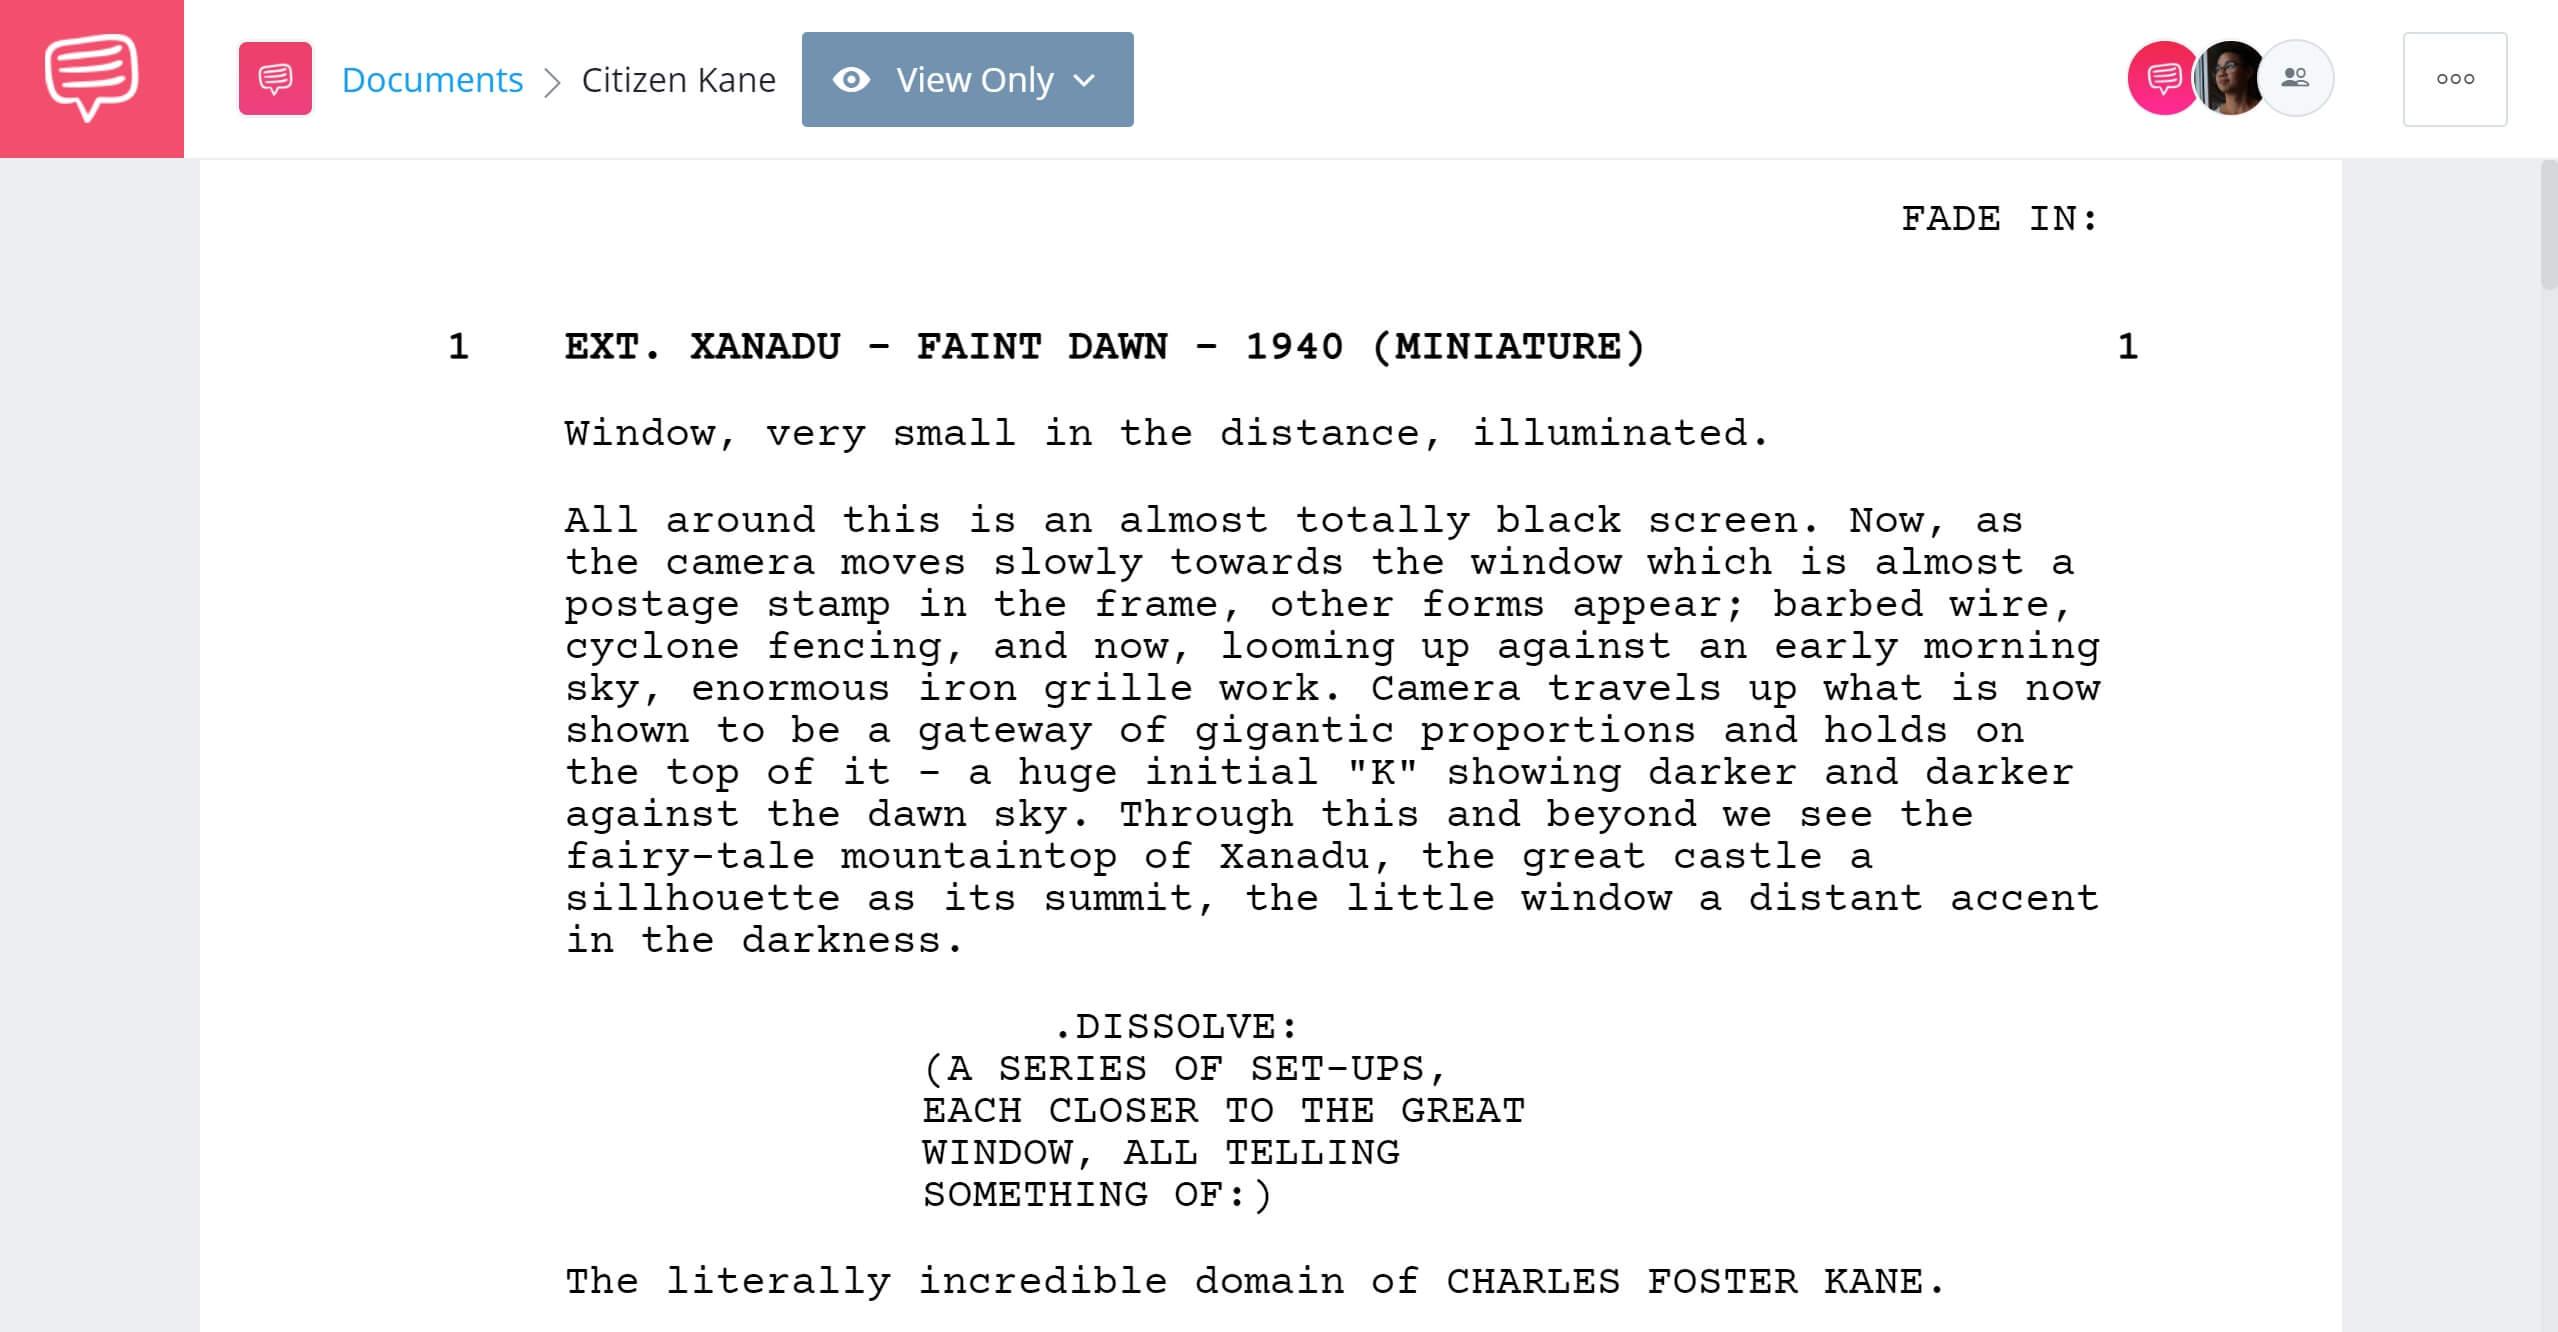 Best Original Screenplay Academy Award - Citizen Kane Full Script PDF Download - StudioBinder Screenwriting Software